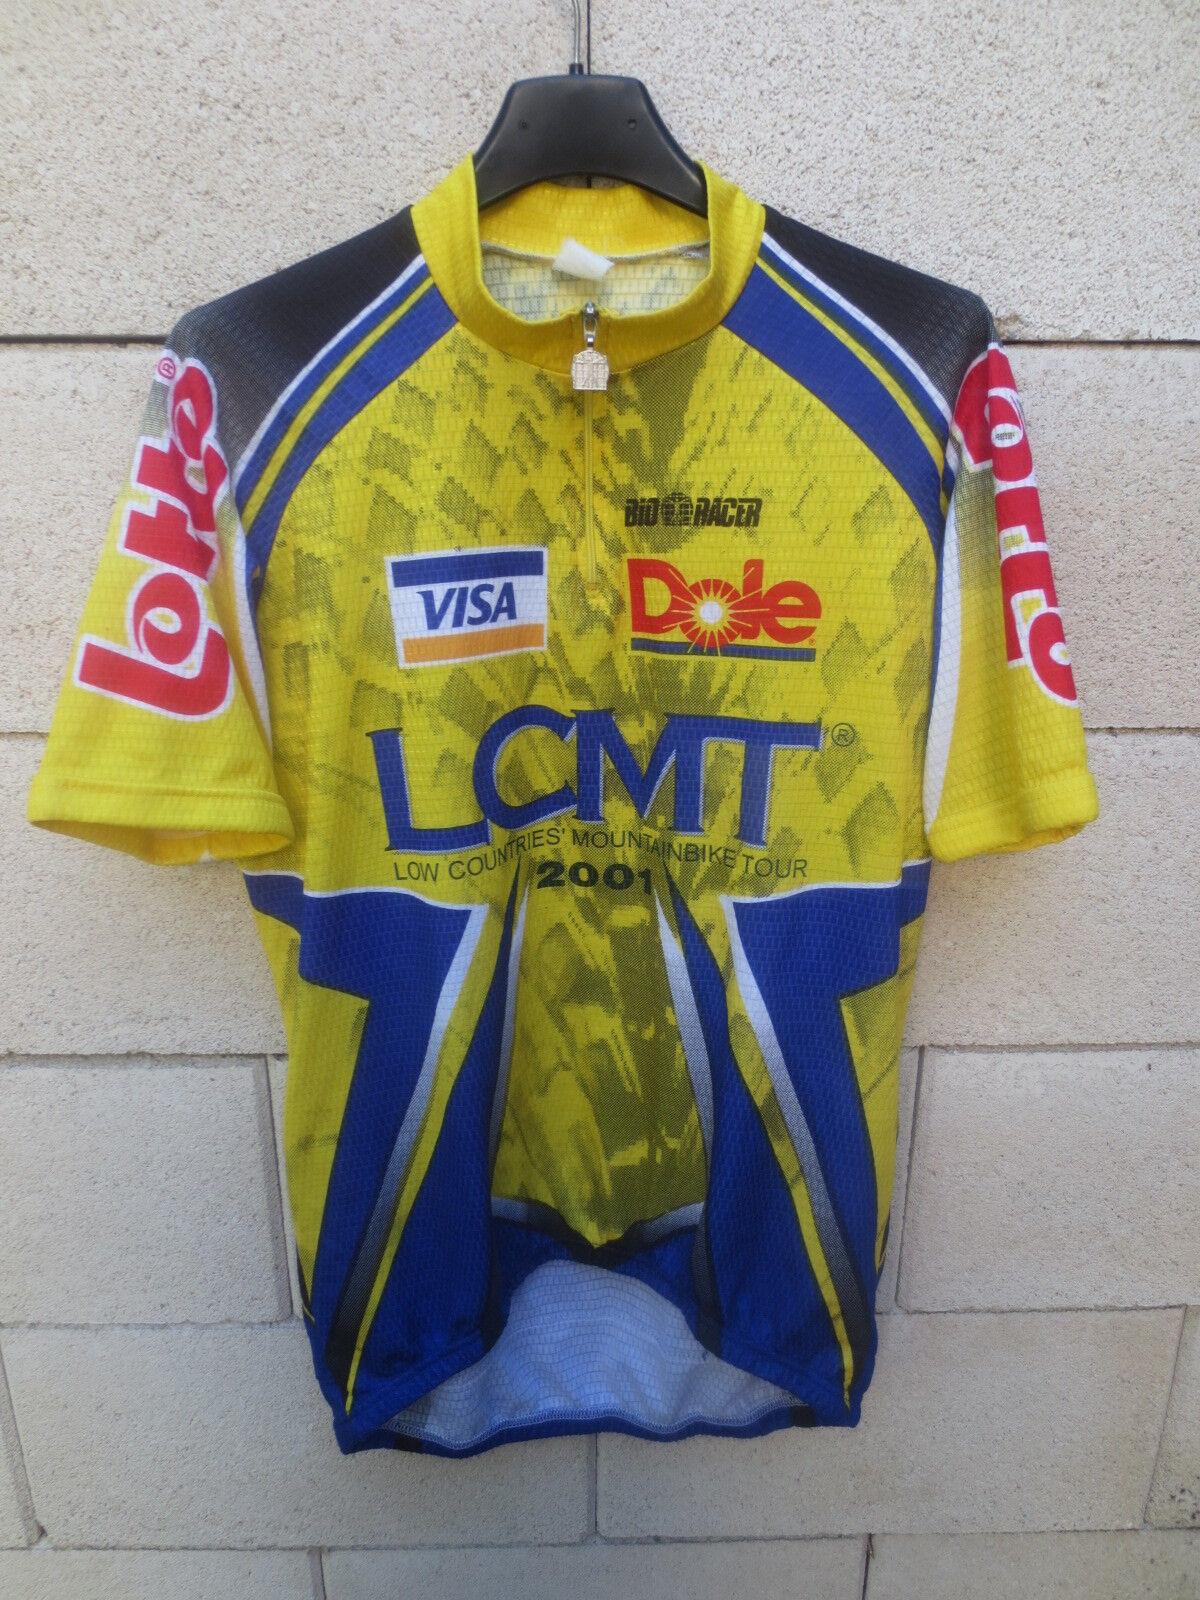 Maillot cycliste LCMT MOUTAIN BIKE 2001 Bio Racer Lotto shirt trikot camiseta 4